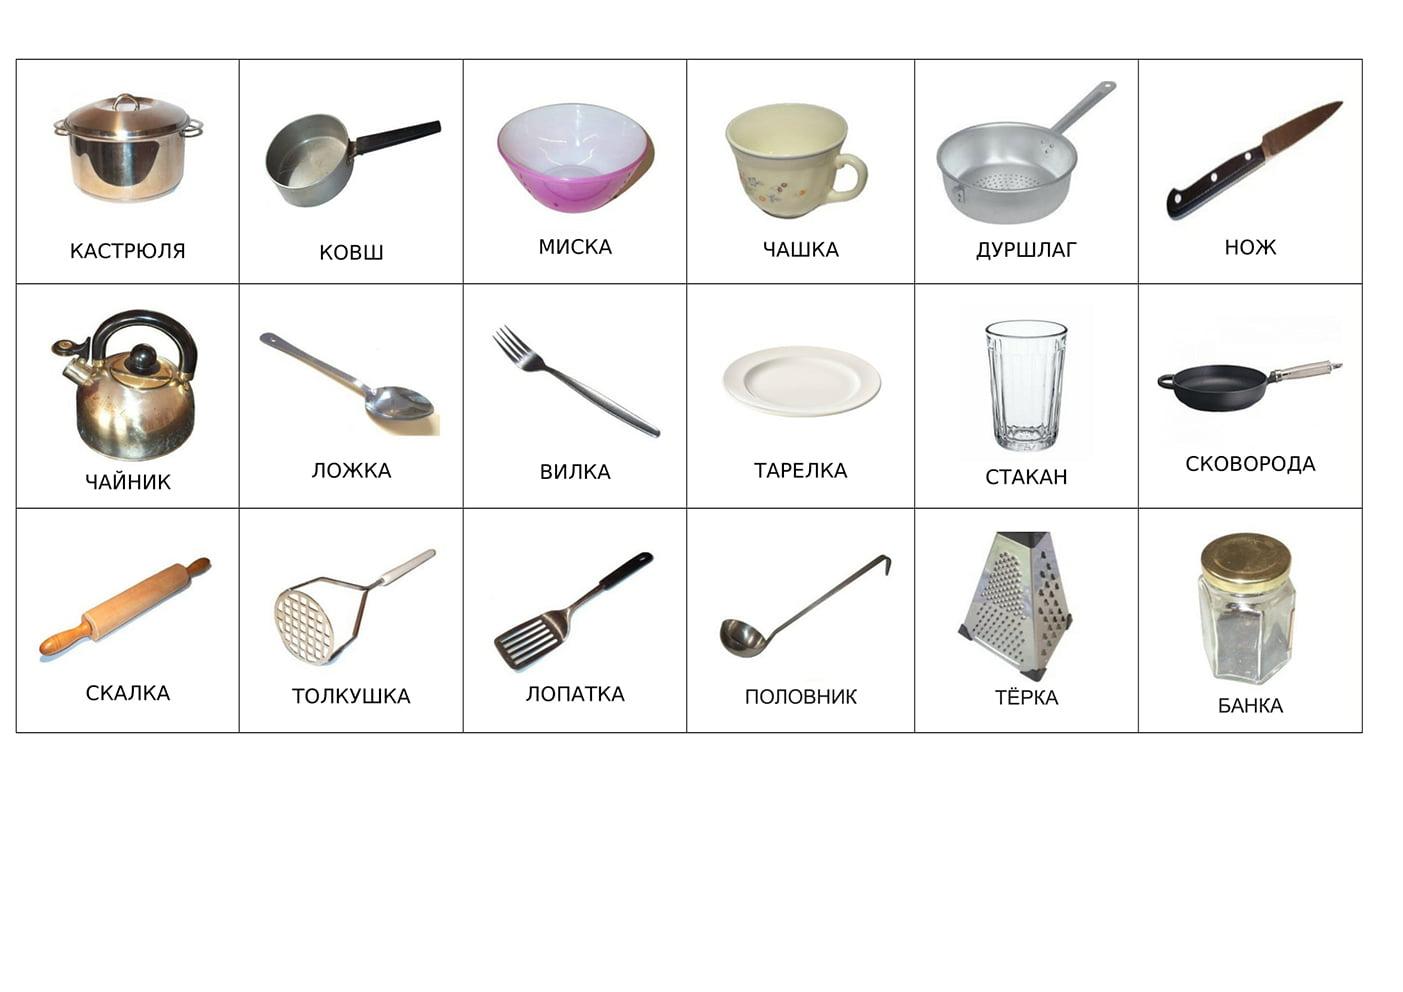 Посуда (с подписями на русском)